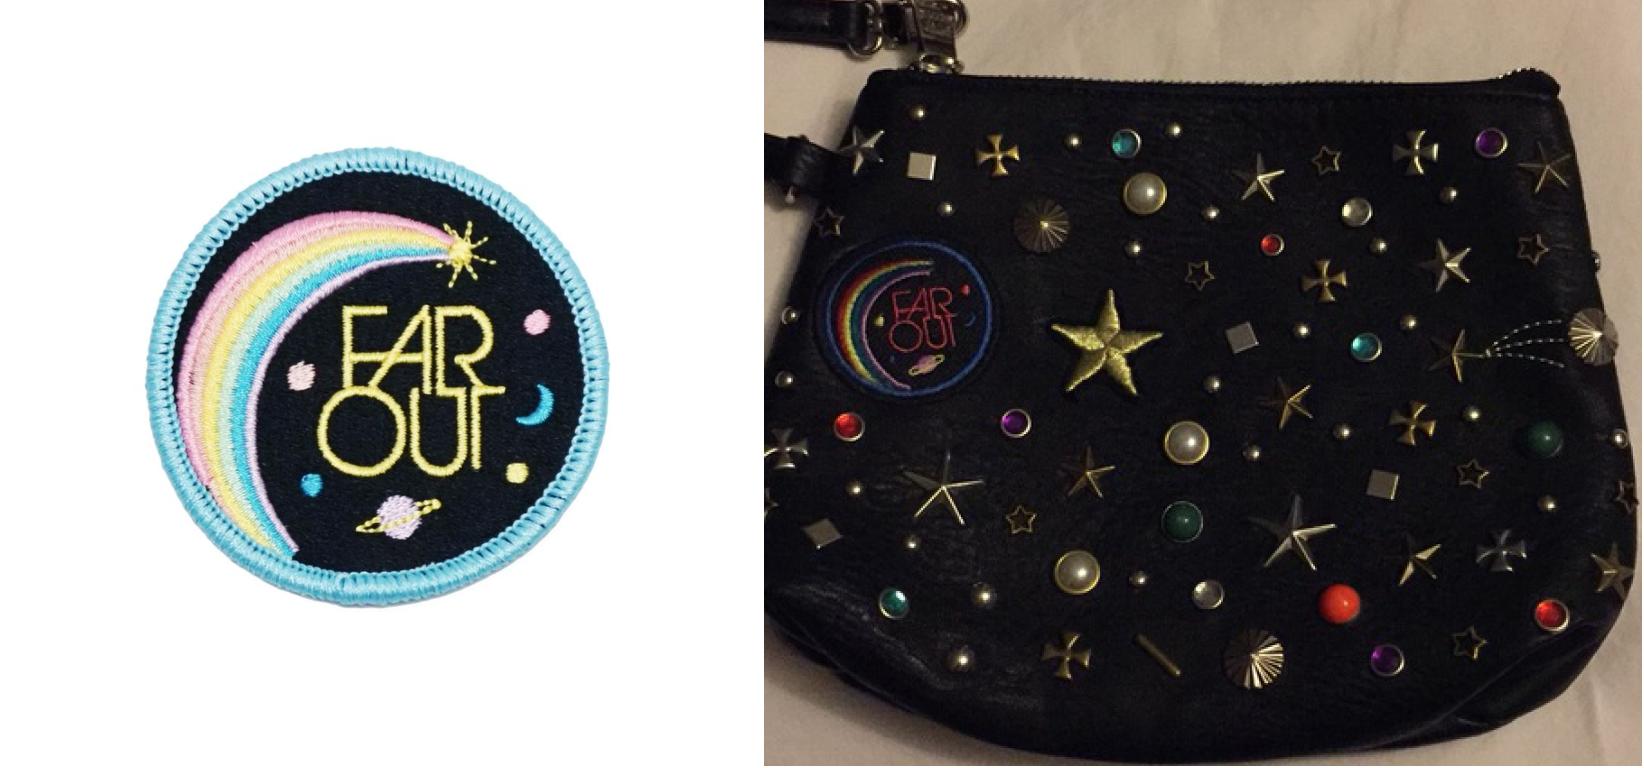 Lucky Horse's patch (left) & Steve Madden's bag (right)